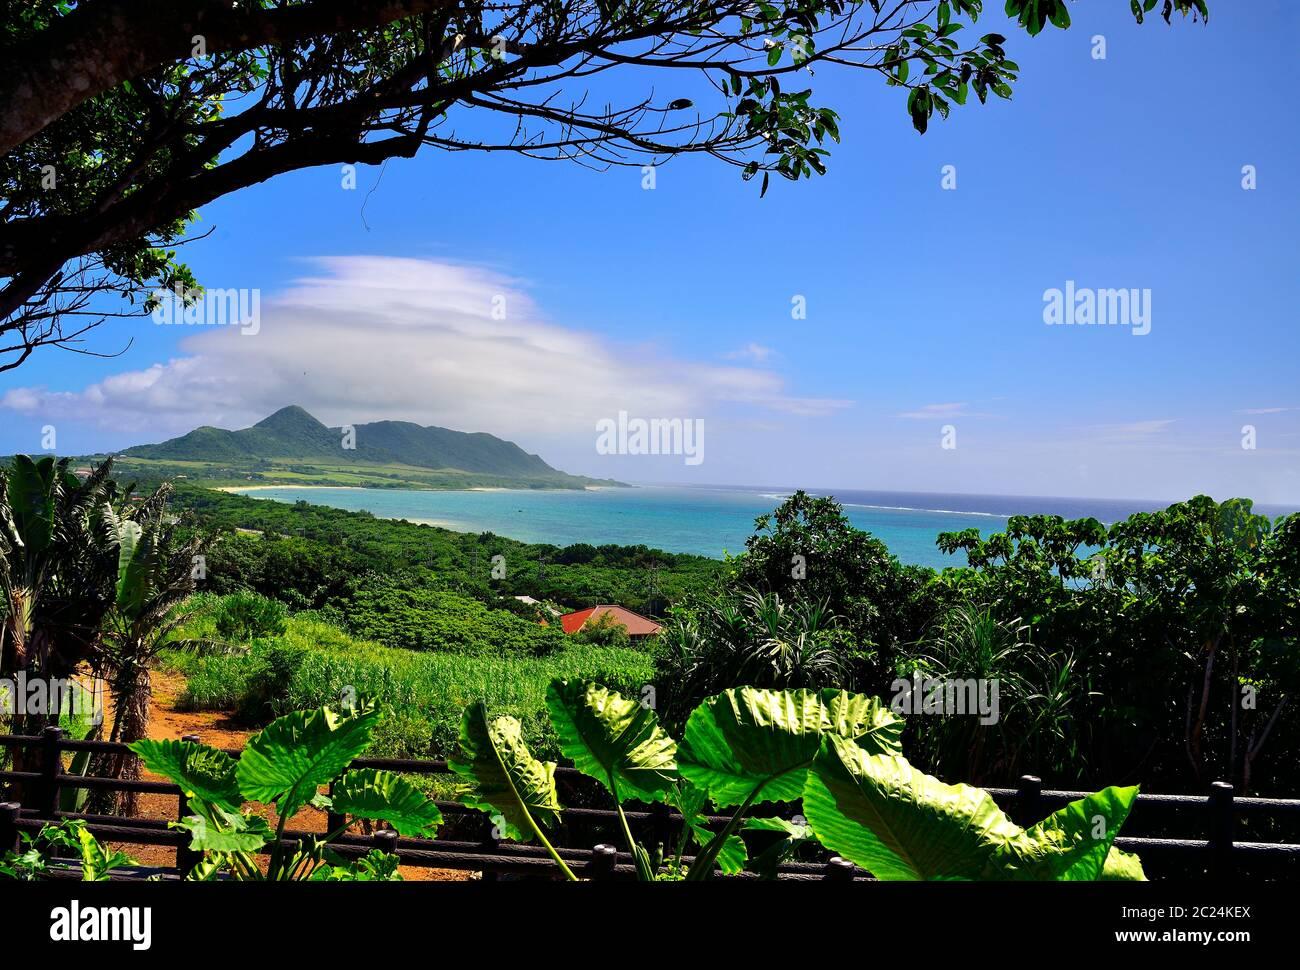 View, From Tamatorizak, Ishigaki, Yahema Islands, Okinawa, Japan Stock Photo